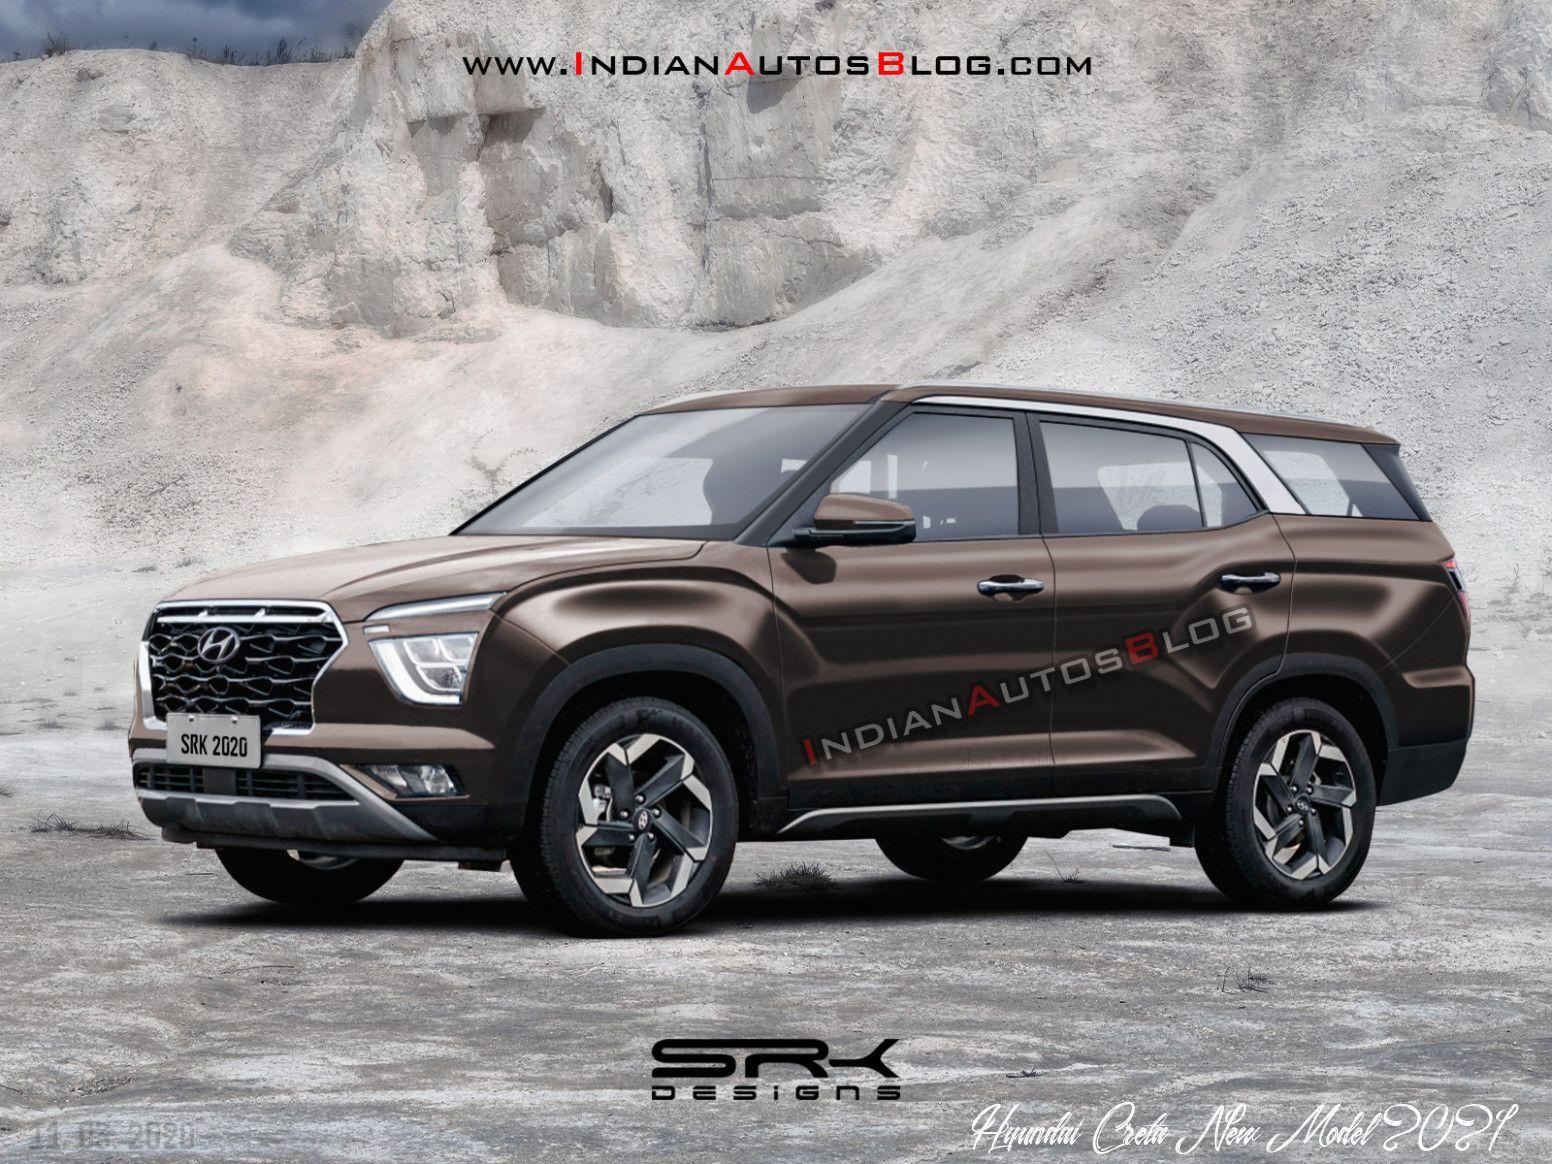 Hyundai Creta New Model 2021 Spy Shoot In 2020 Hyundai Product Launch Rendering